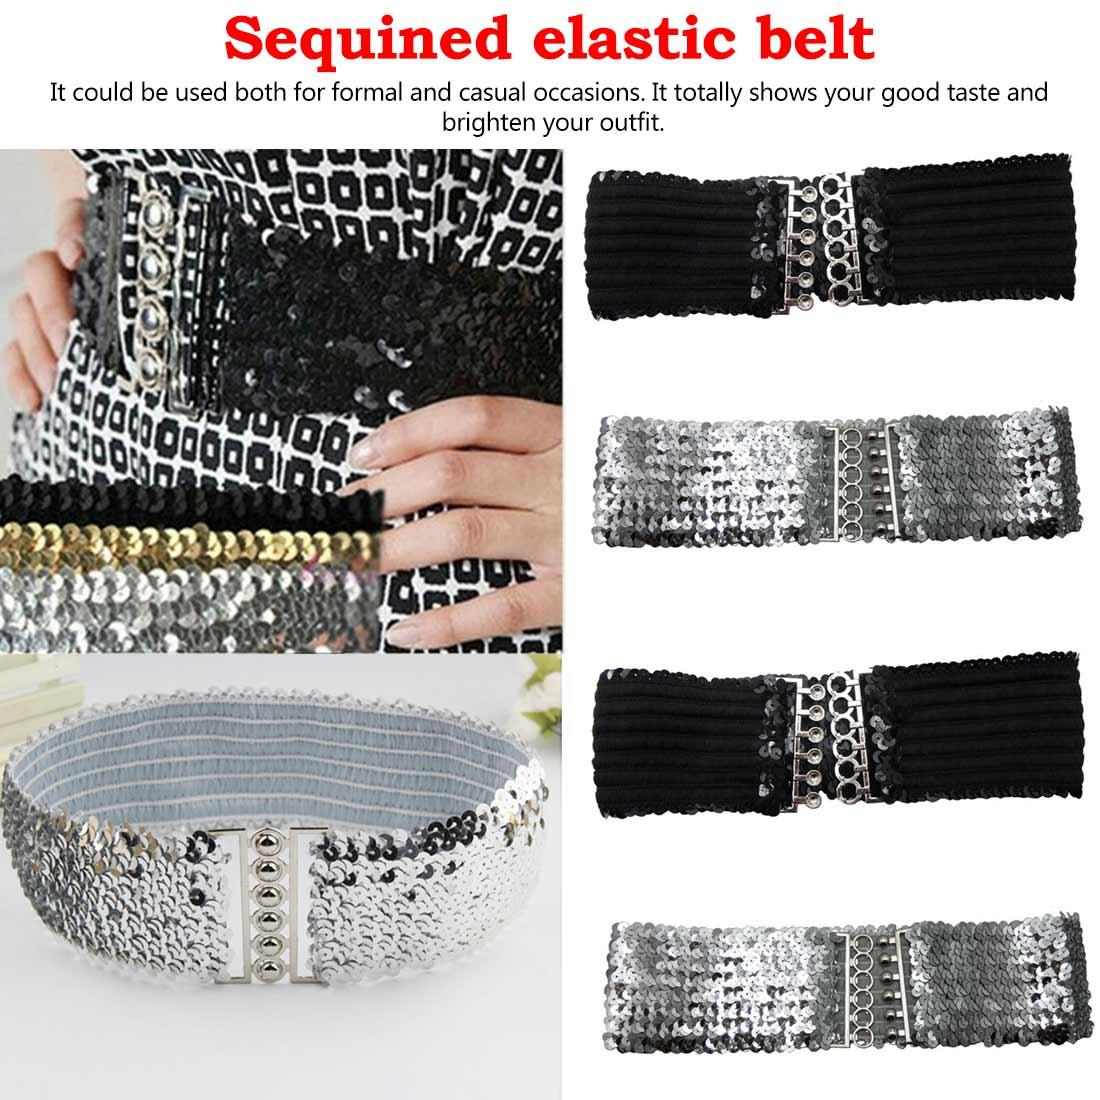 Fashion Vintage Manual Sequins Elastic Belts For Women Dress Accessories Casual Stretch Belt